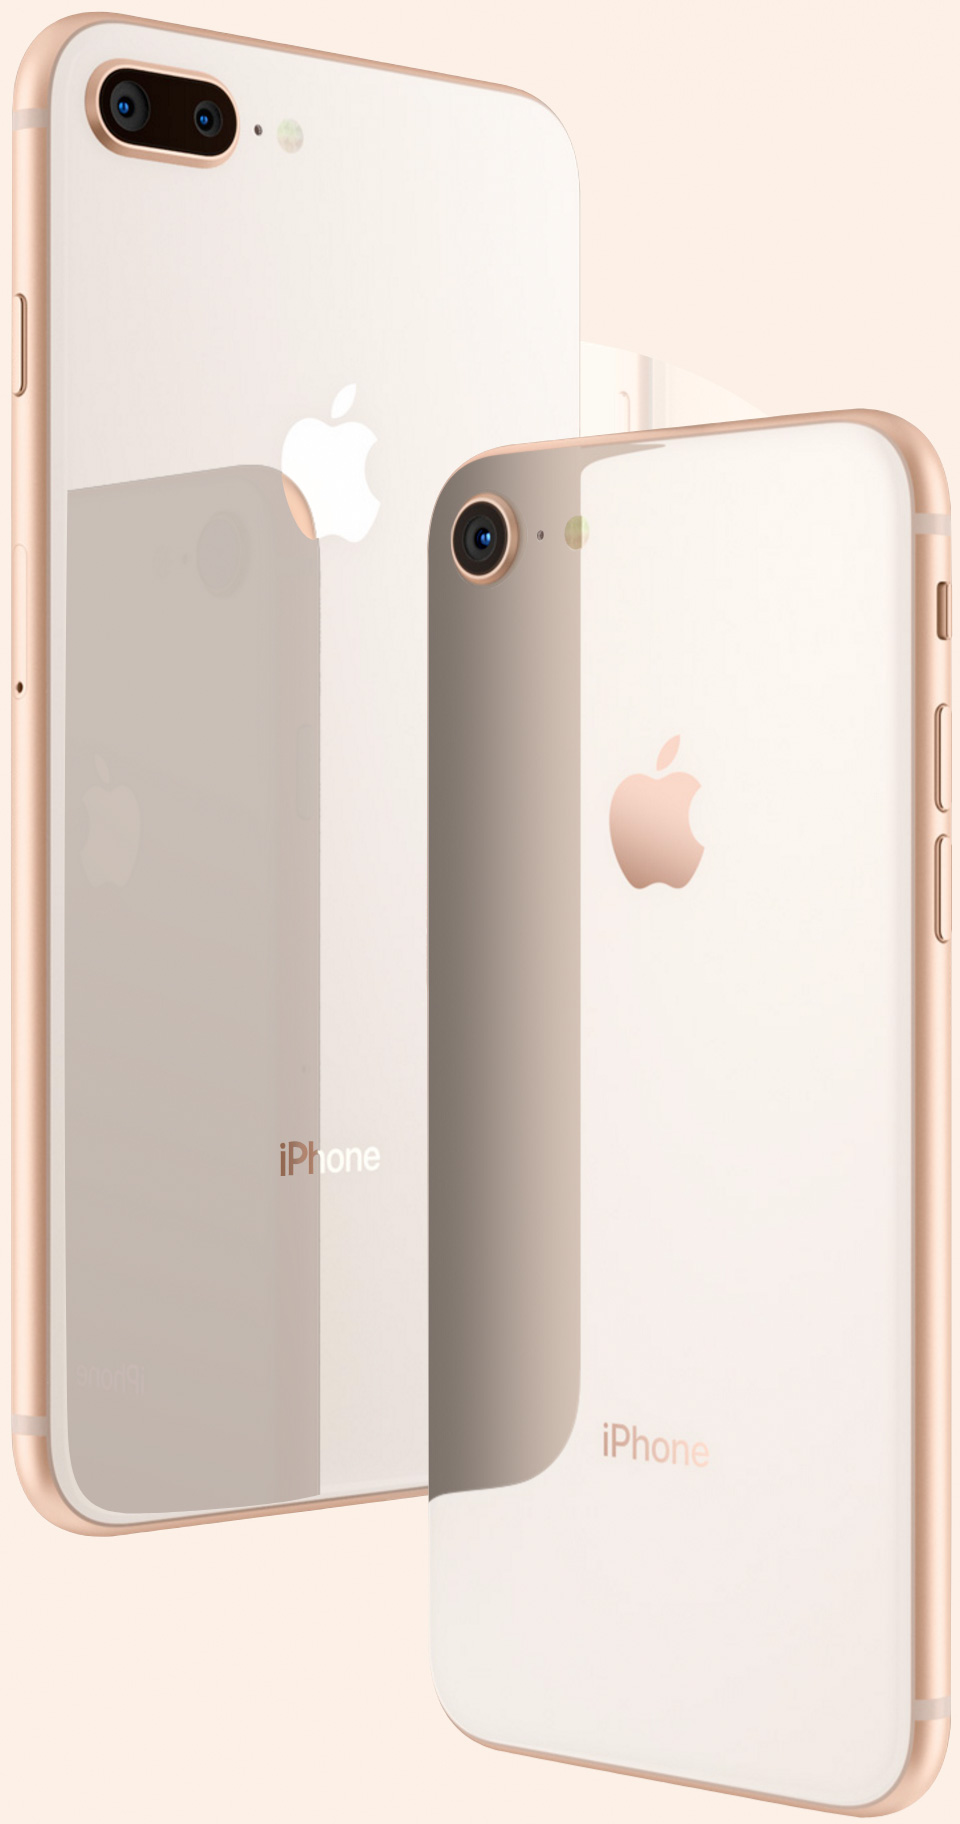 iPhone ocho y ocho Plus dorados